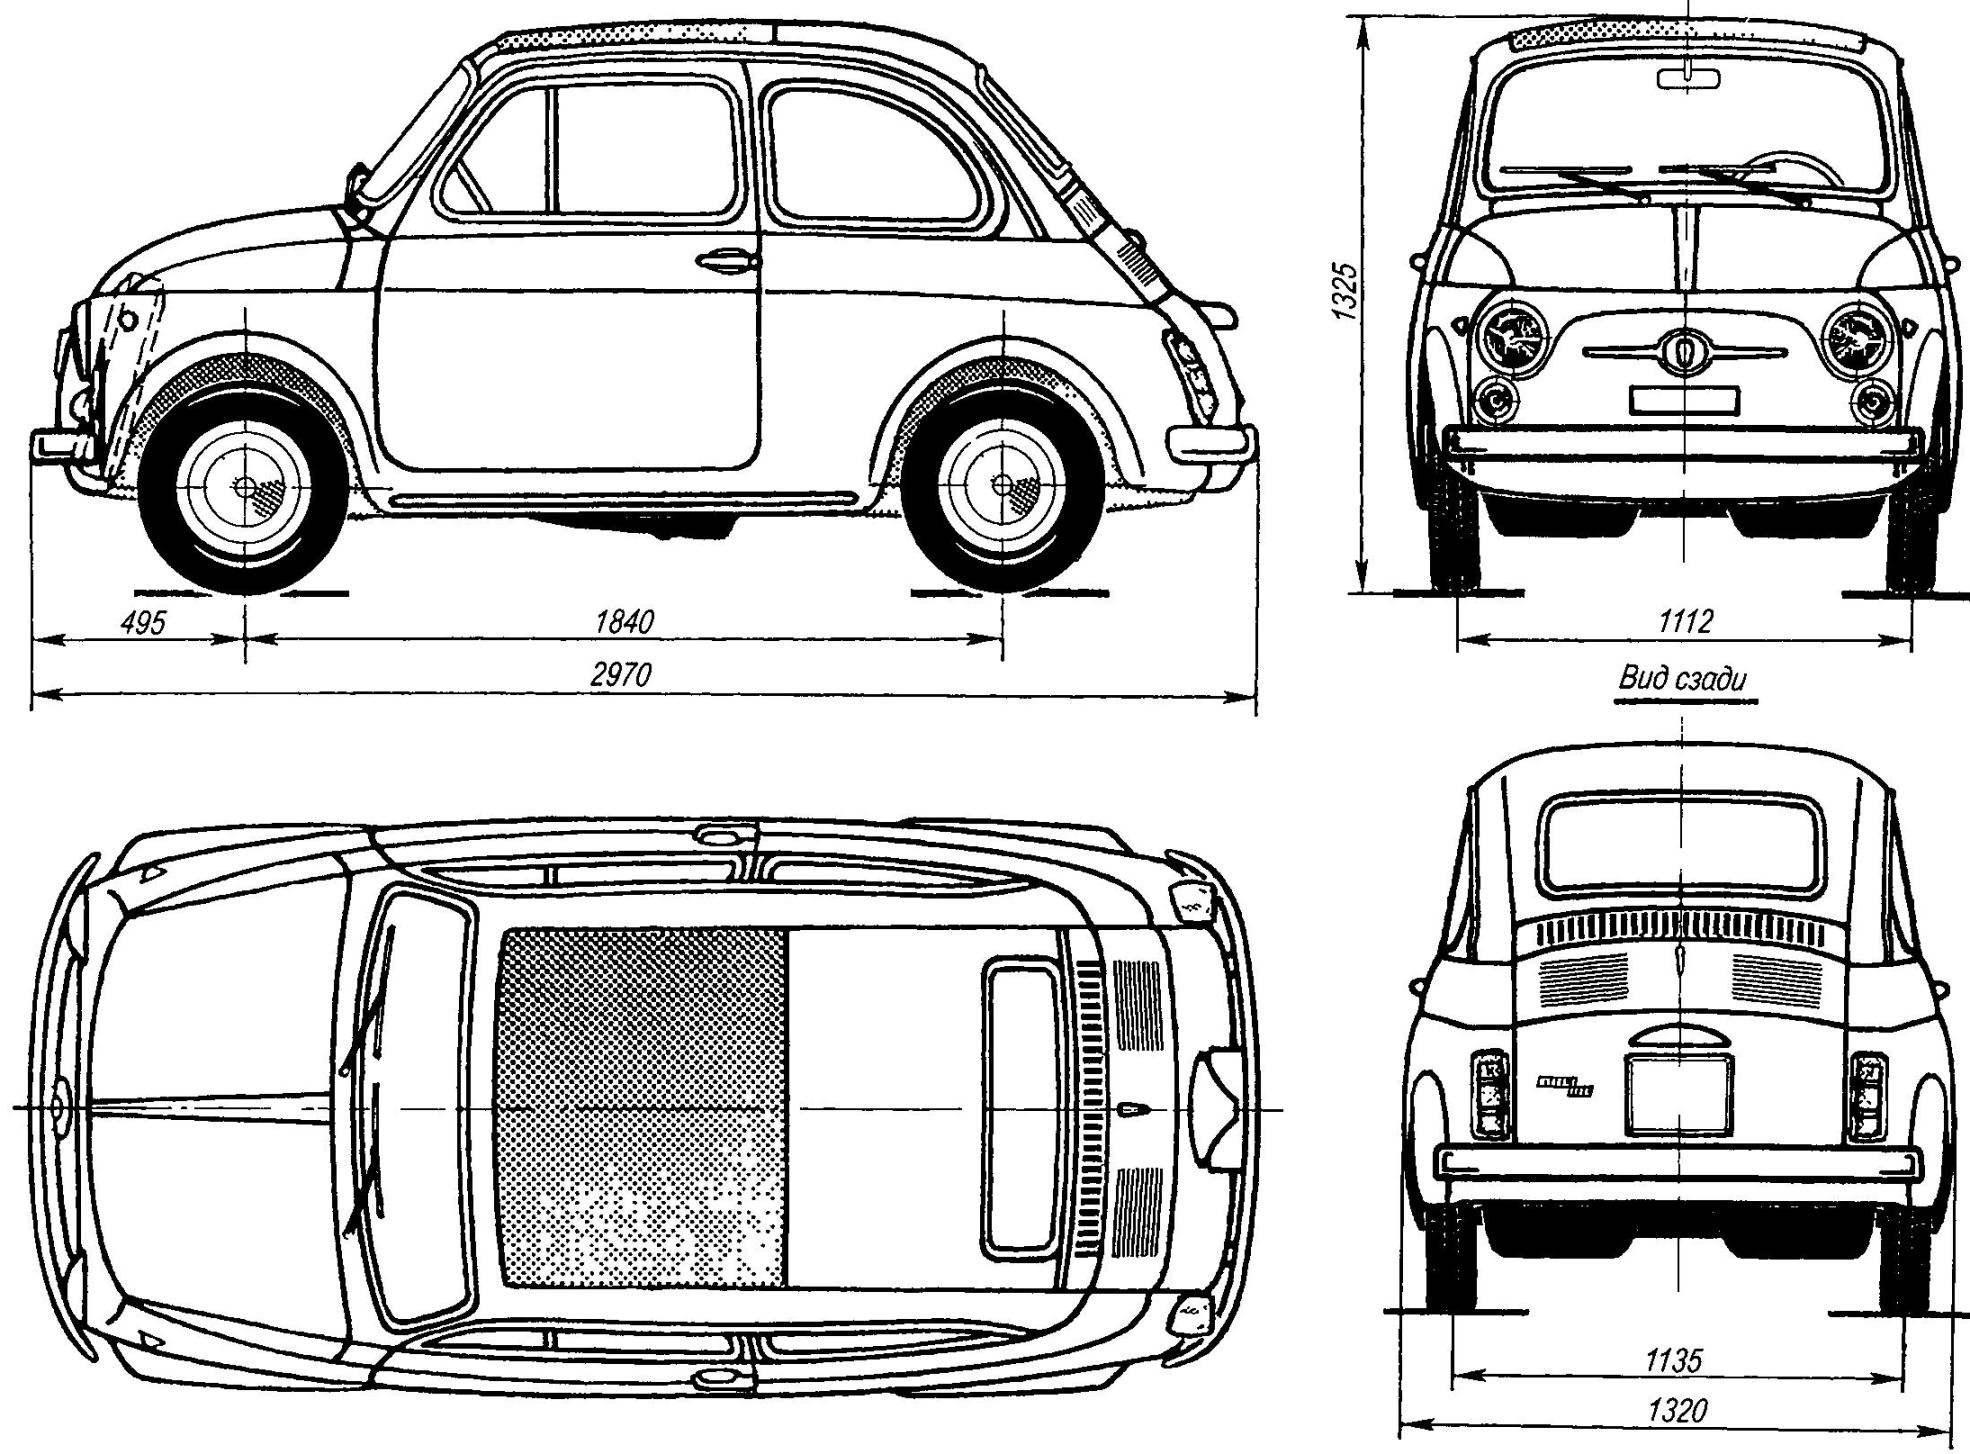 Геометрическая схема автомобиля FIAT-500 Nuova (Bambino)